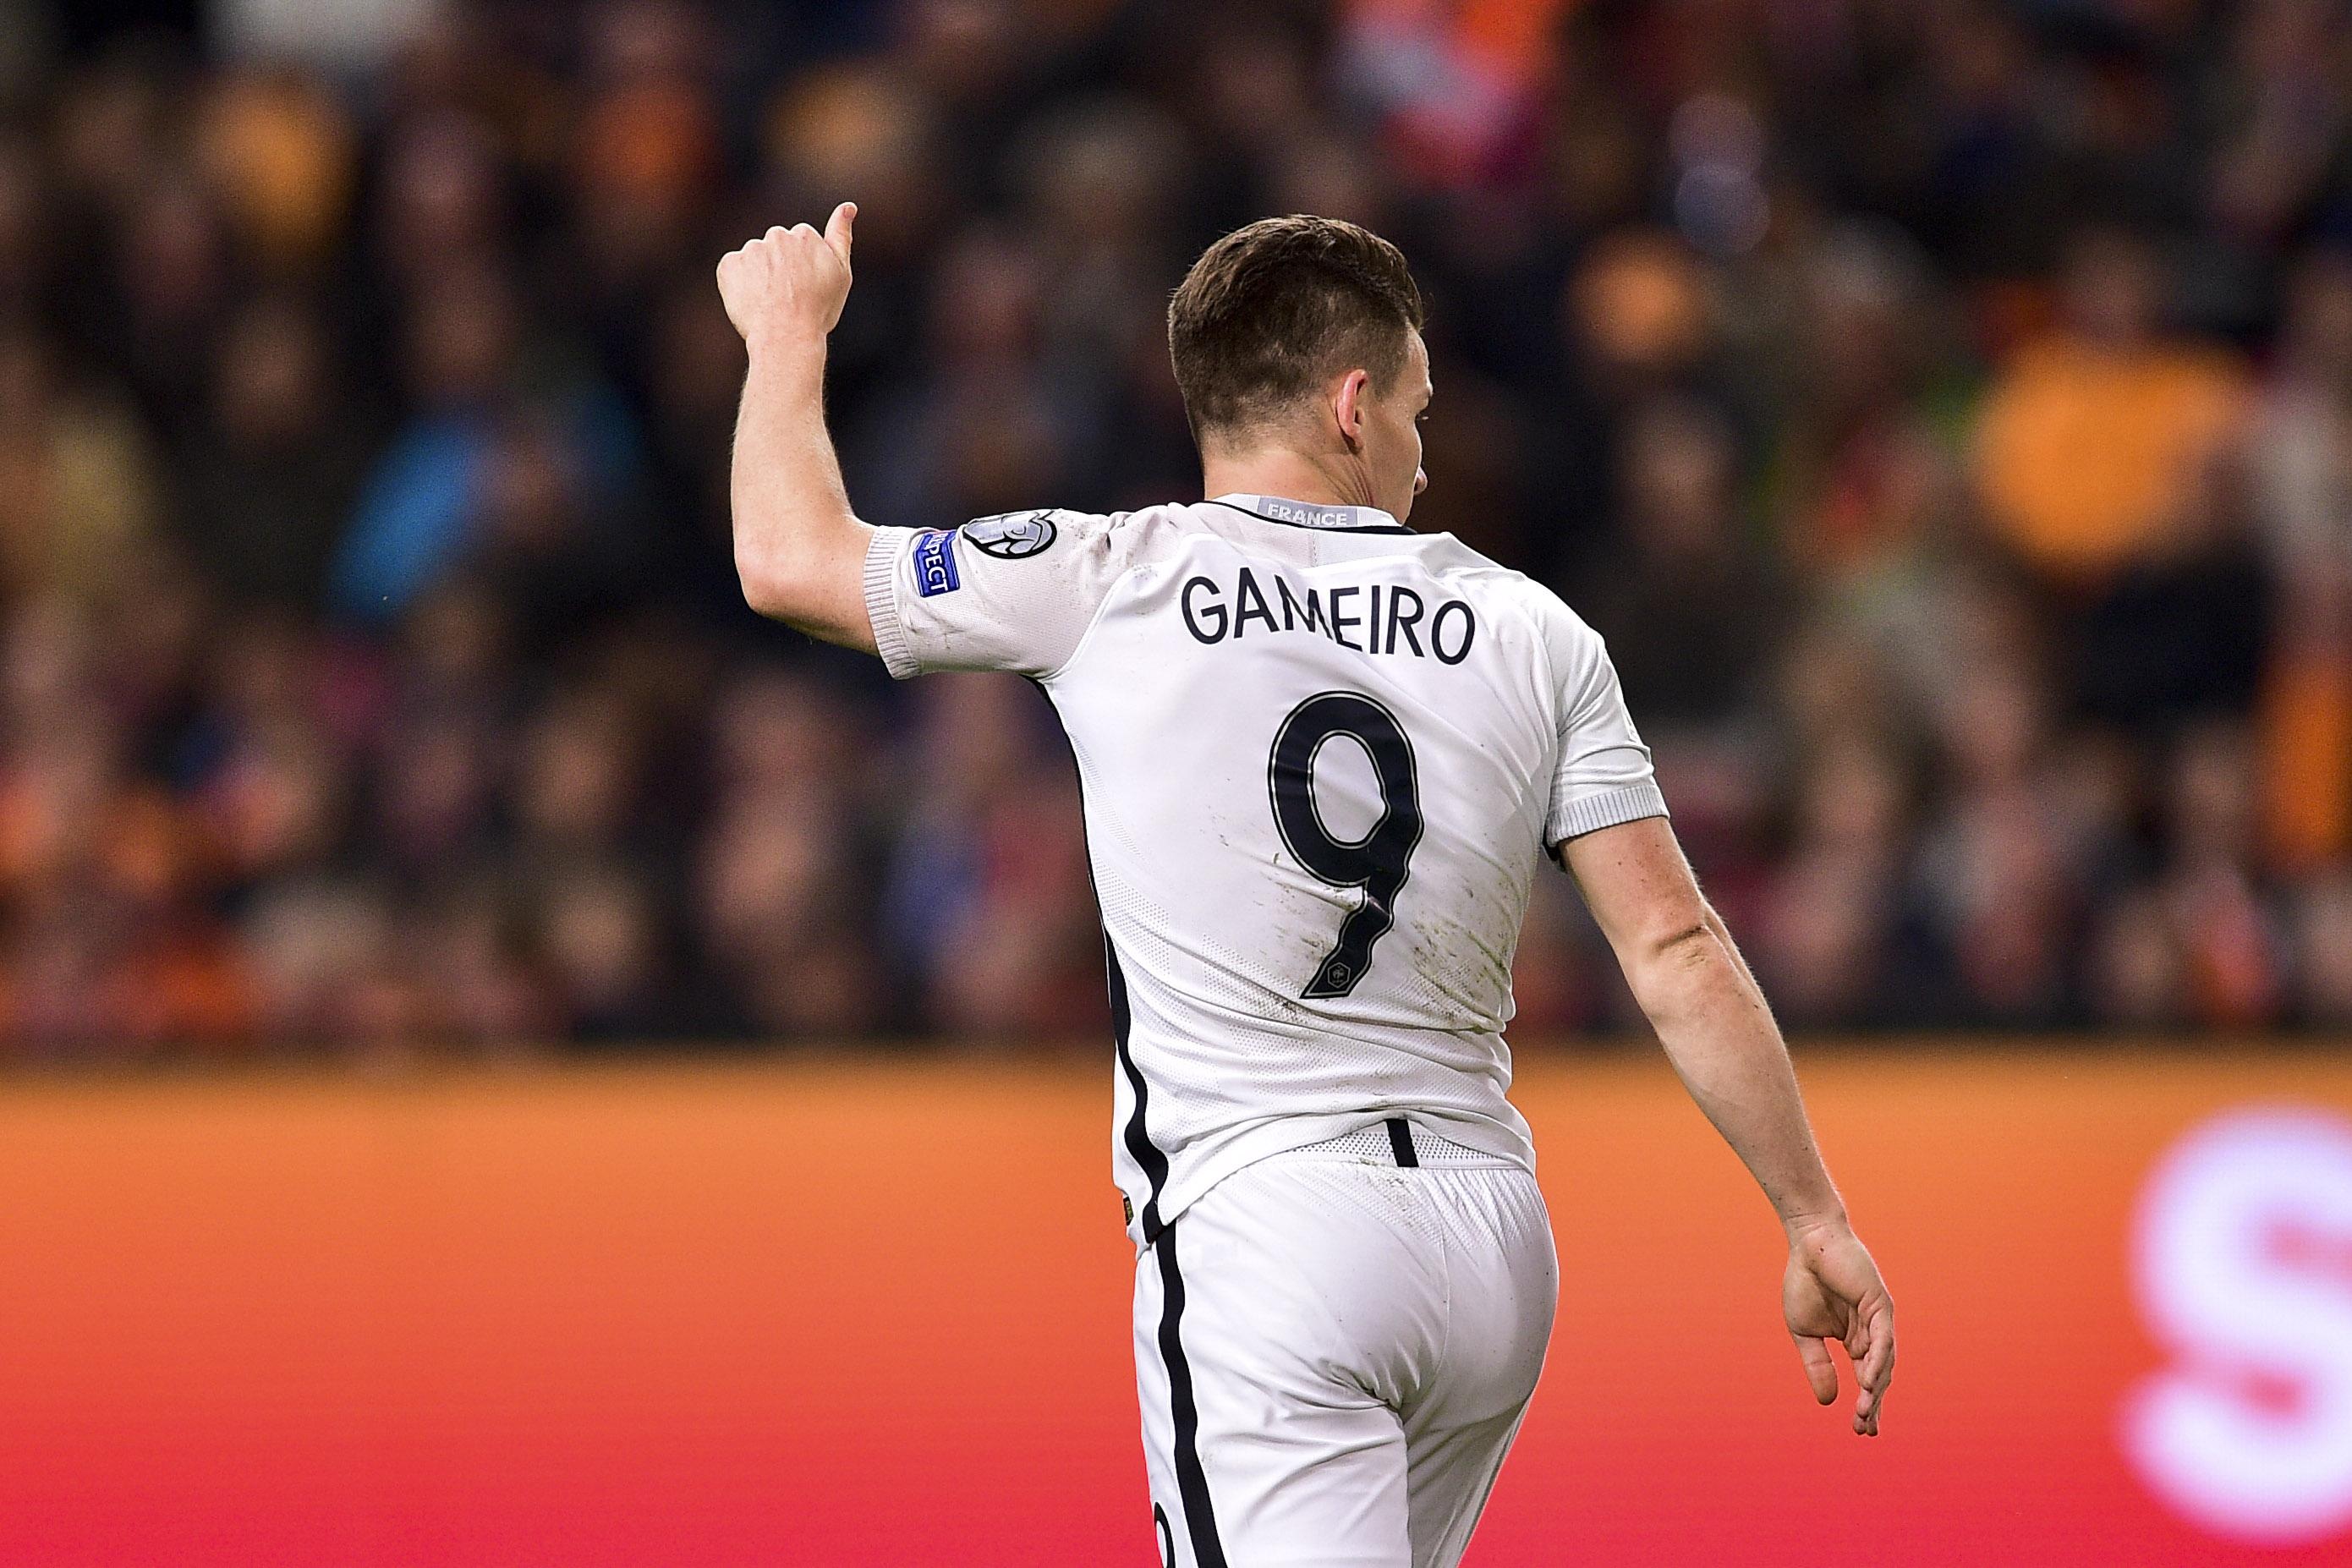 Football - Equipe de France - Débat : Gameiro a-t-il gagné sa place en équipe de France ?